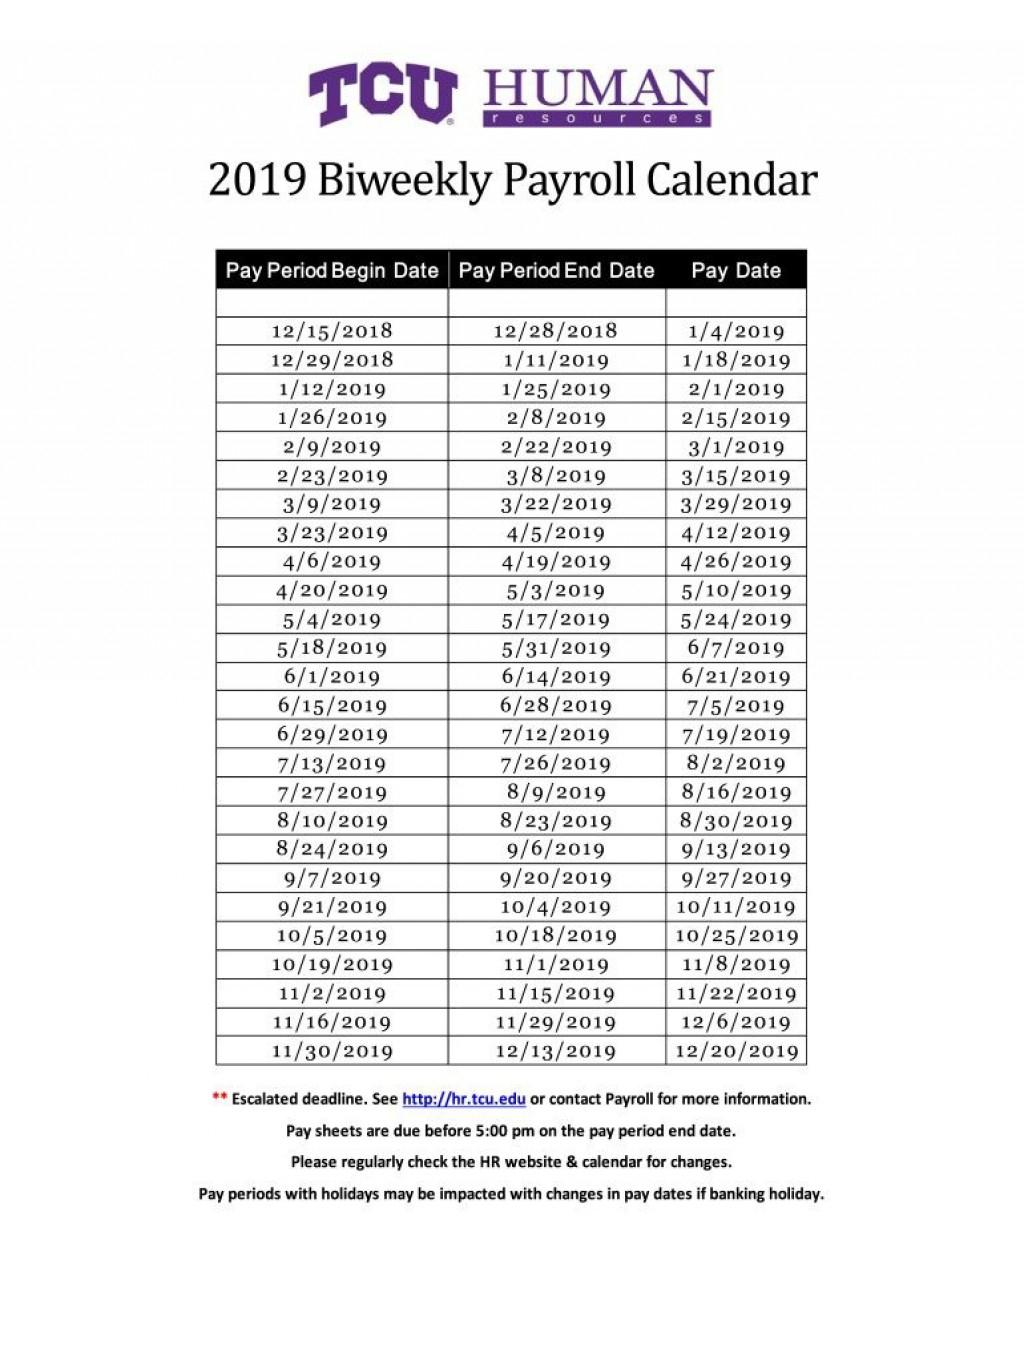 2020 Biweekly Payroll Calendar Template ~ Addictionary